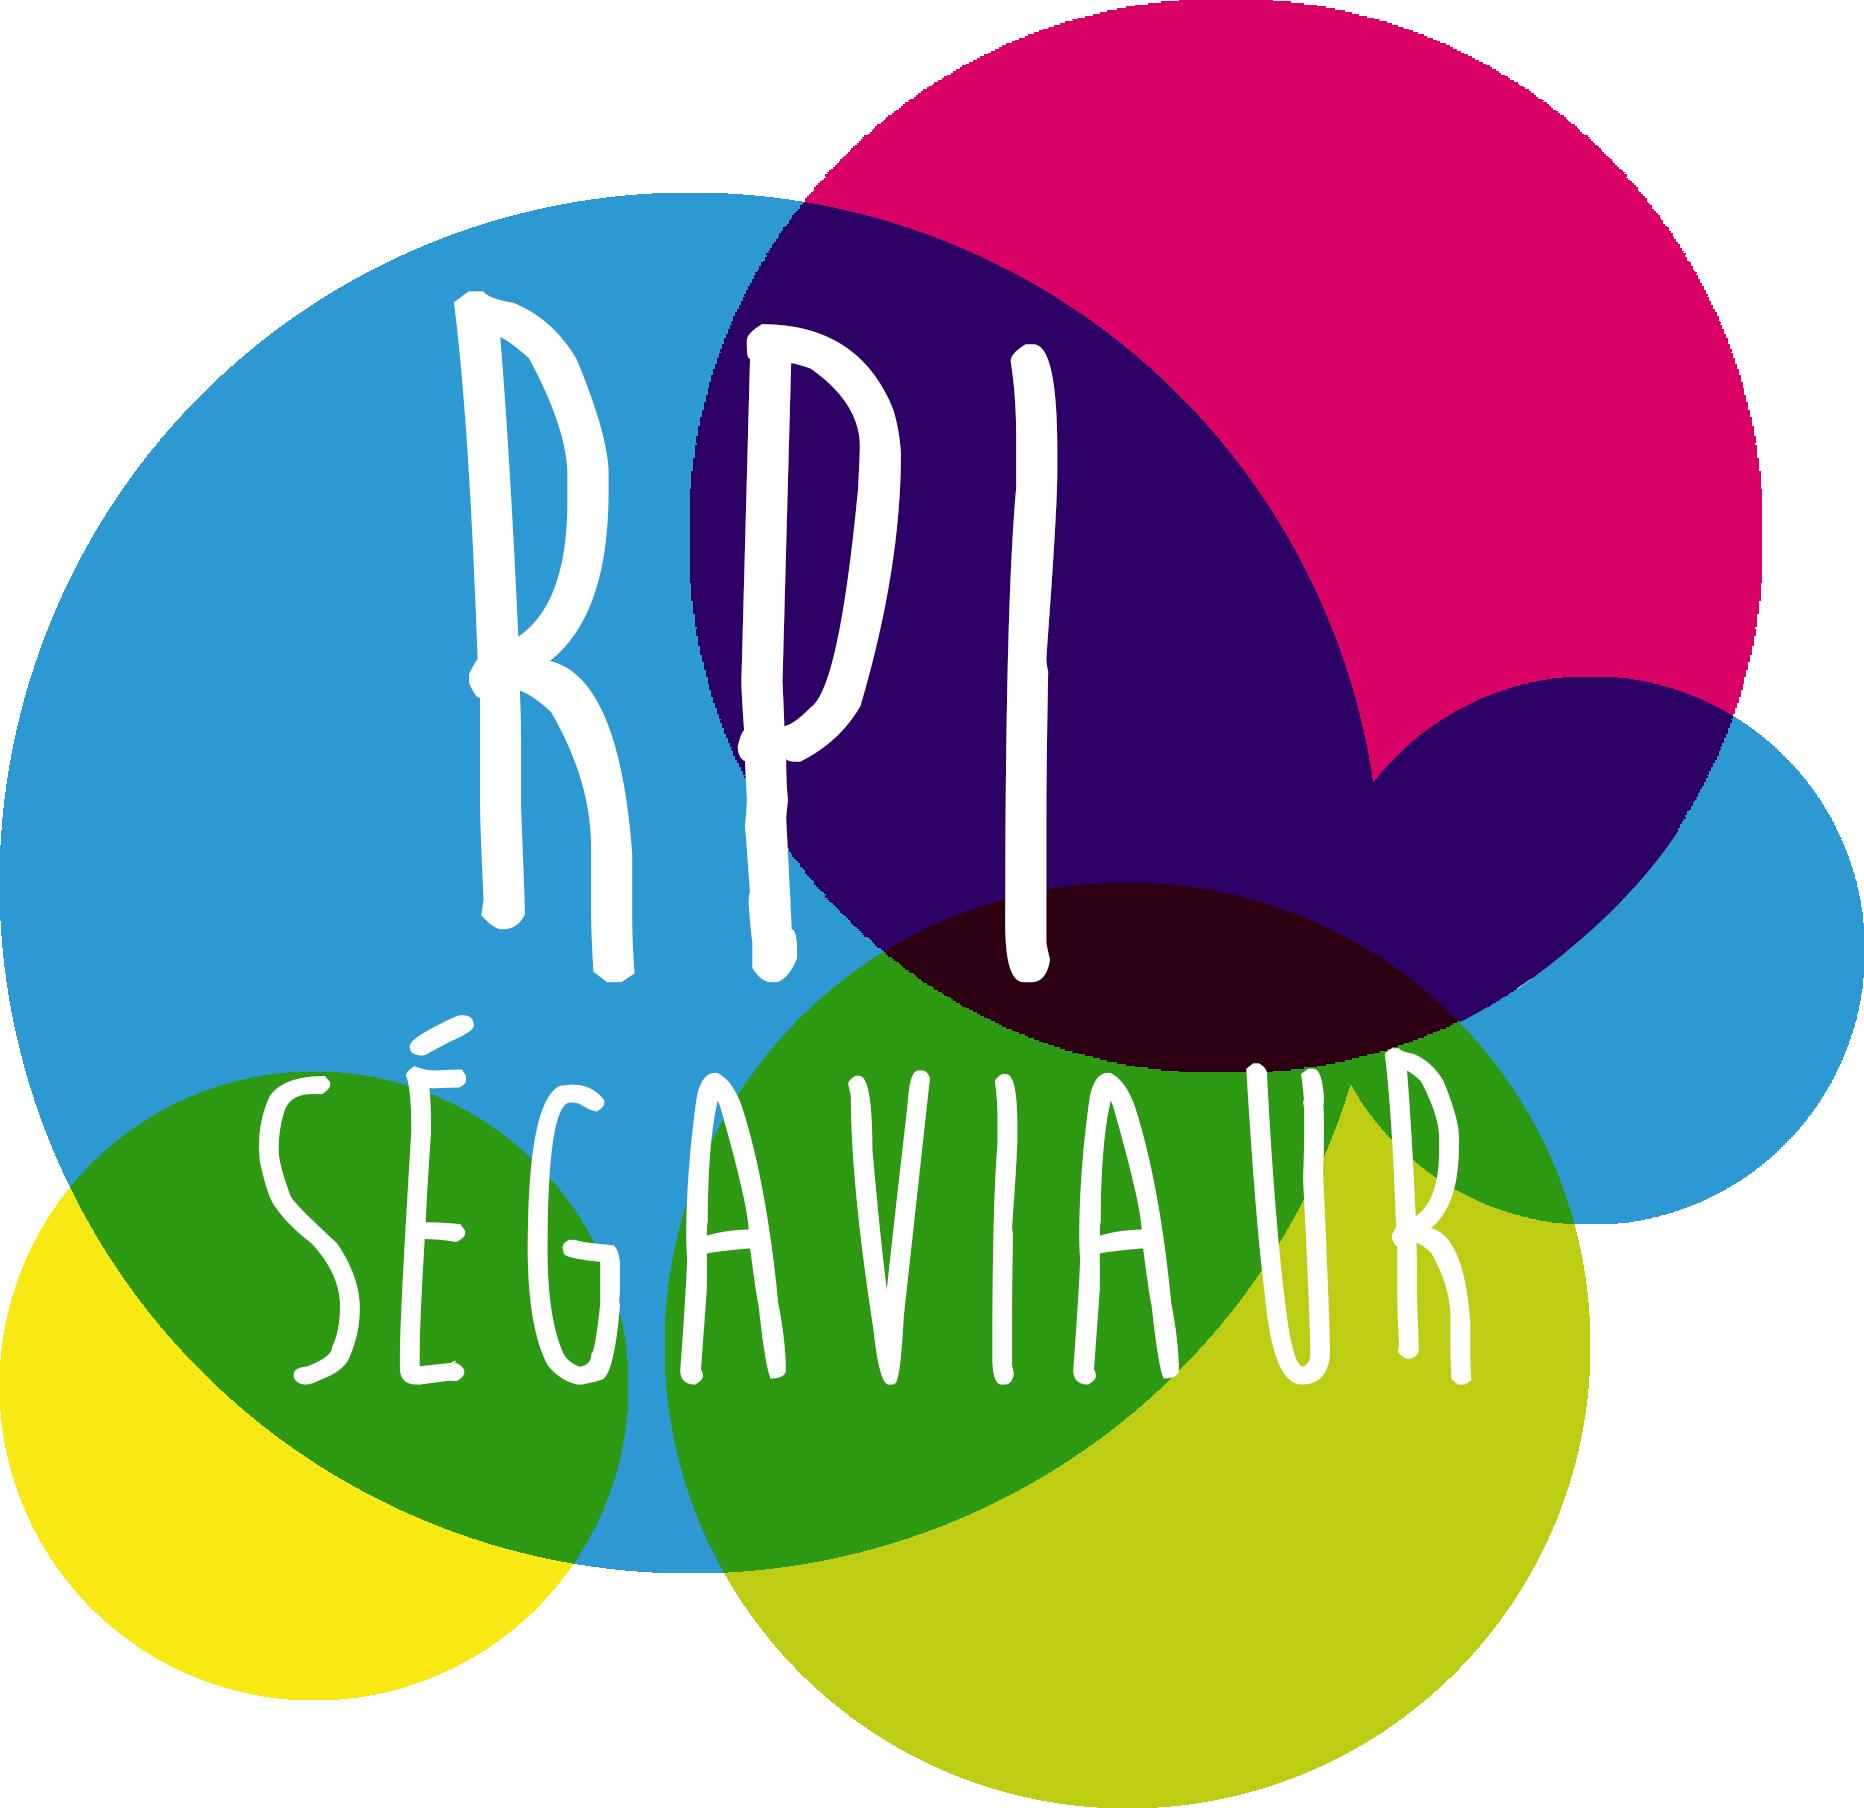 RPI Ségaviaur